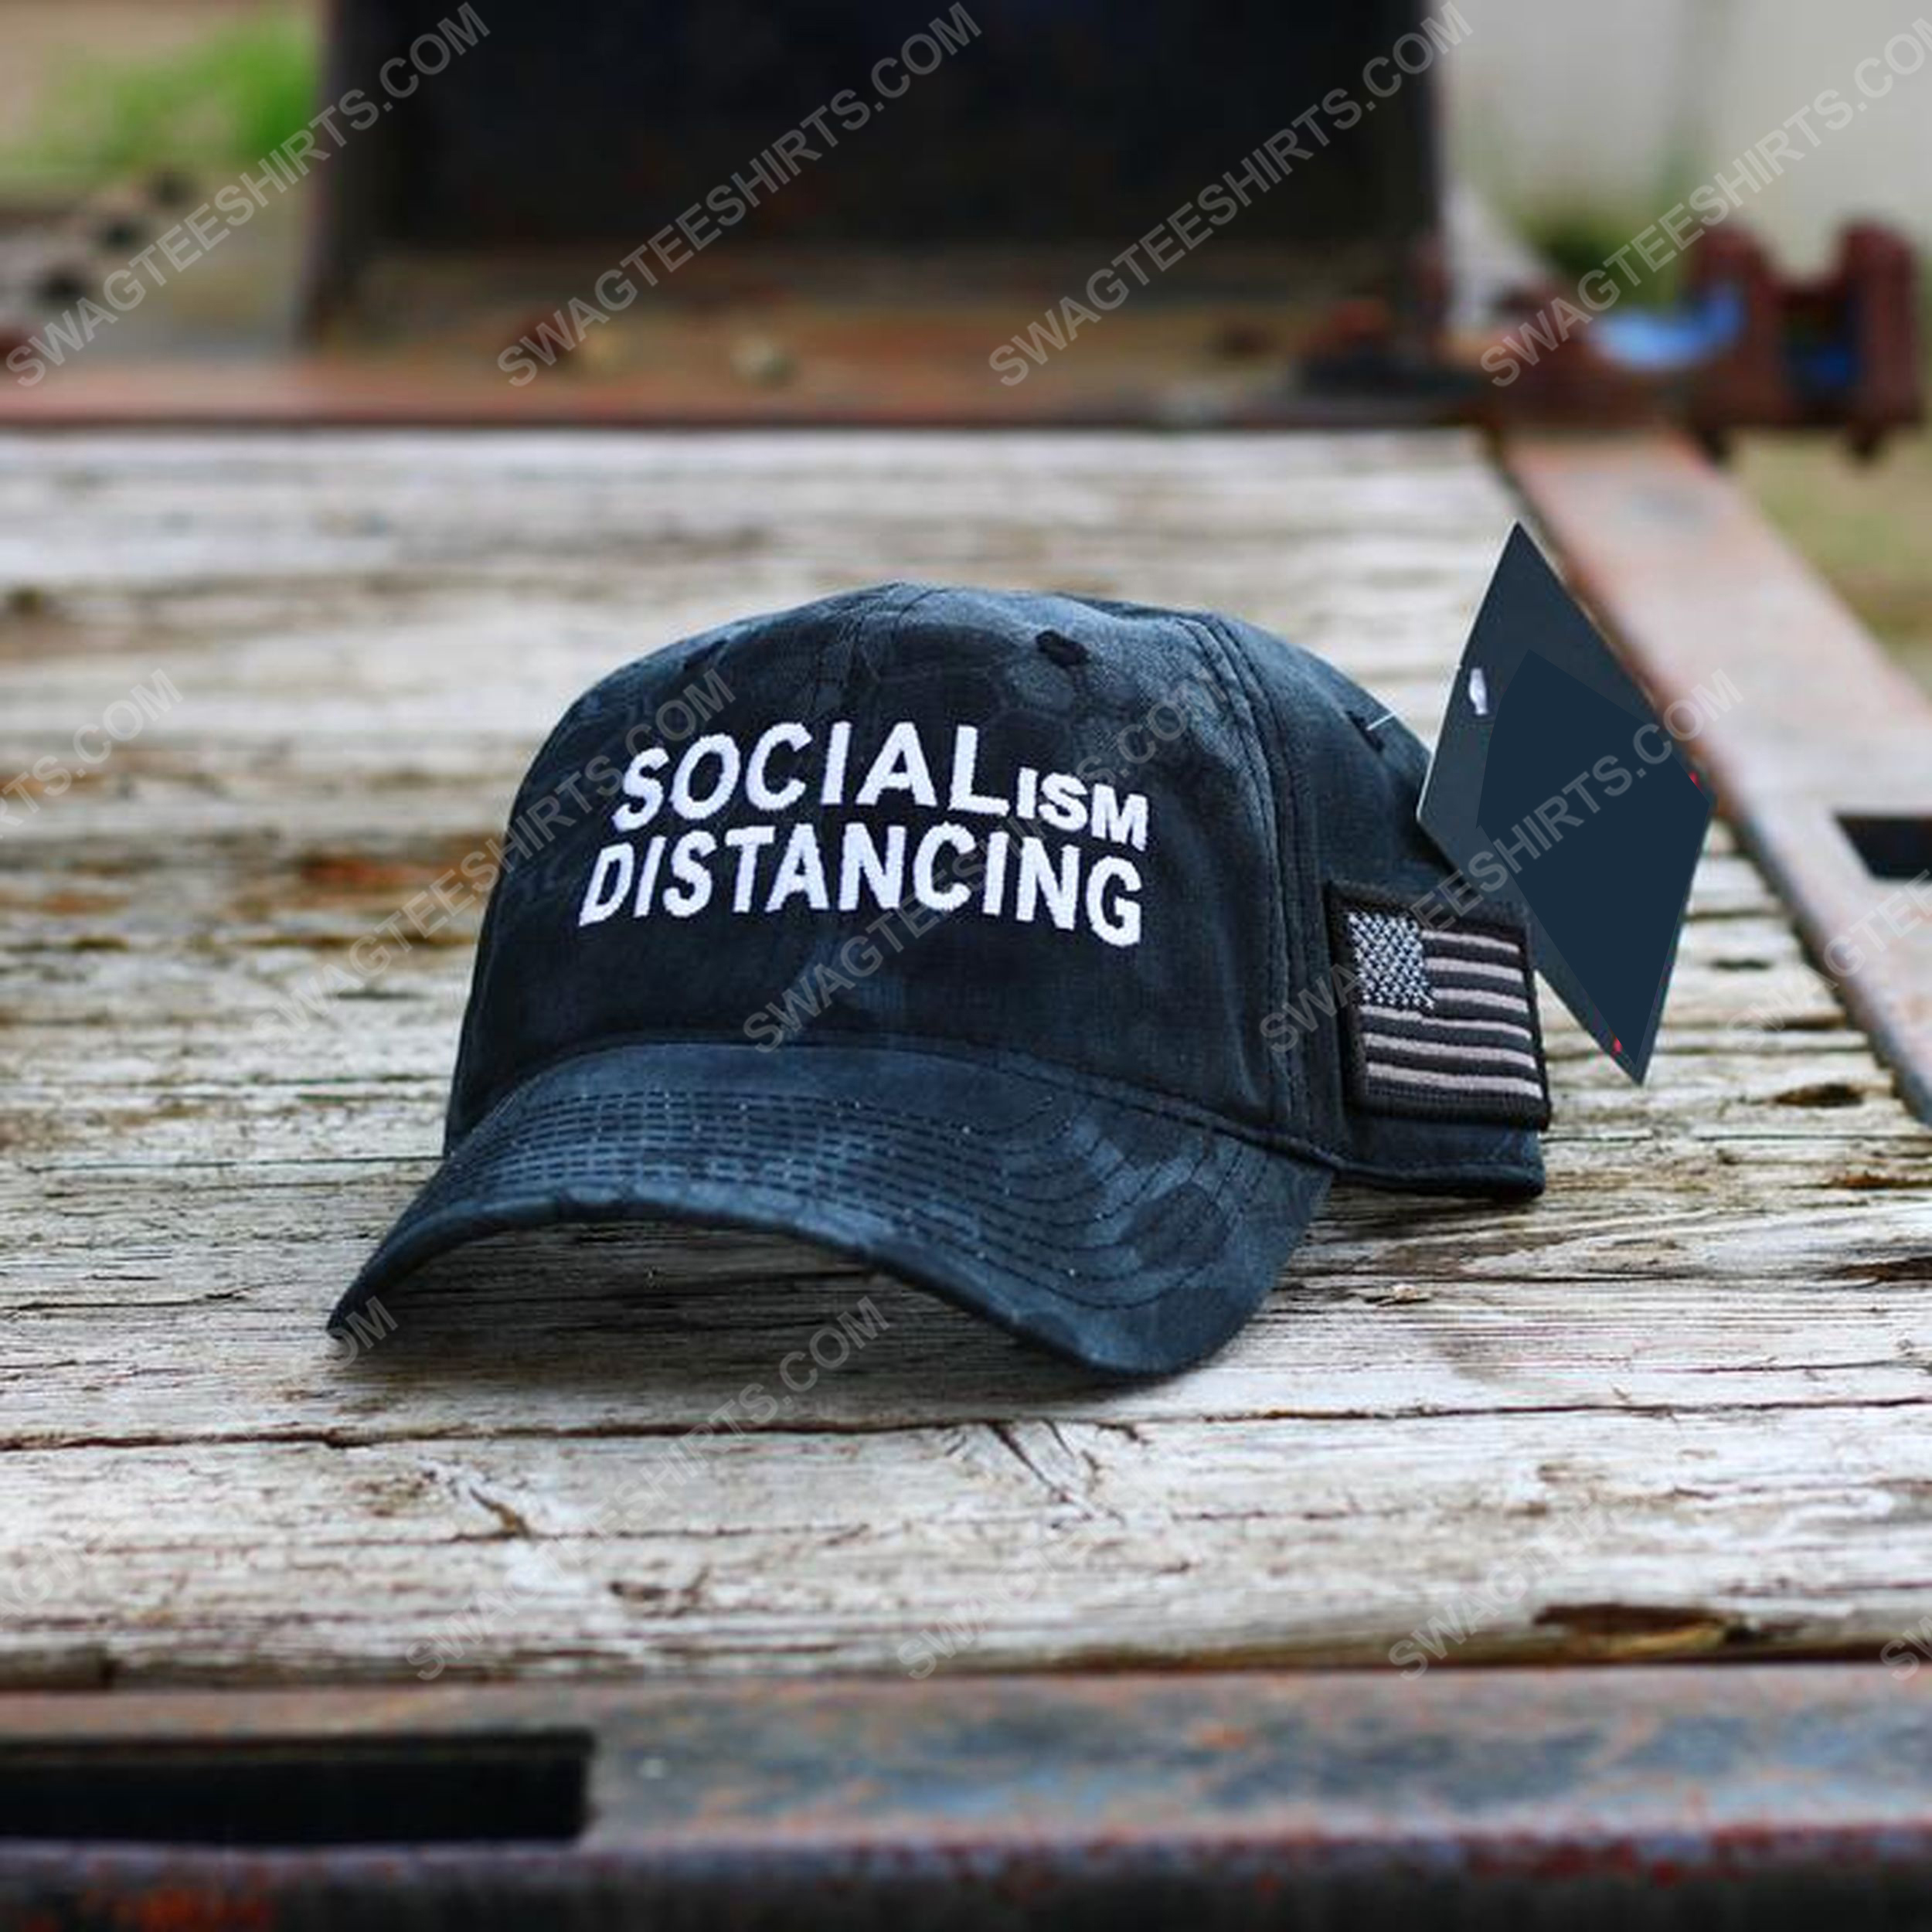 Socialism distancing full print classic hat 1 - Copy (2)